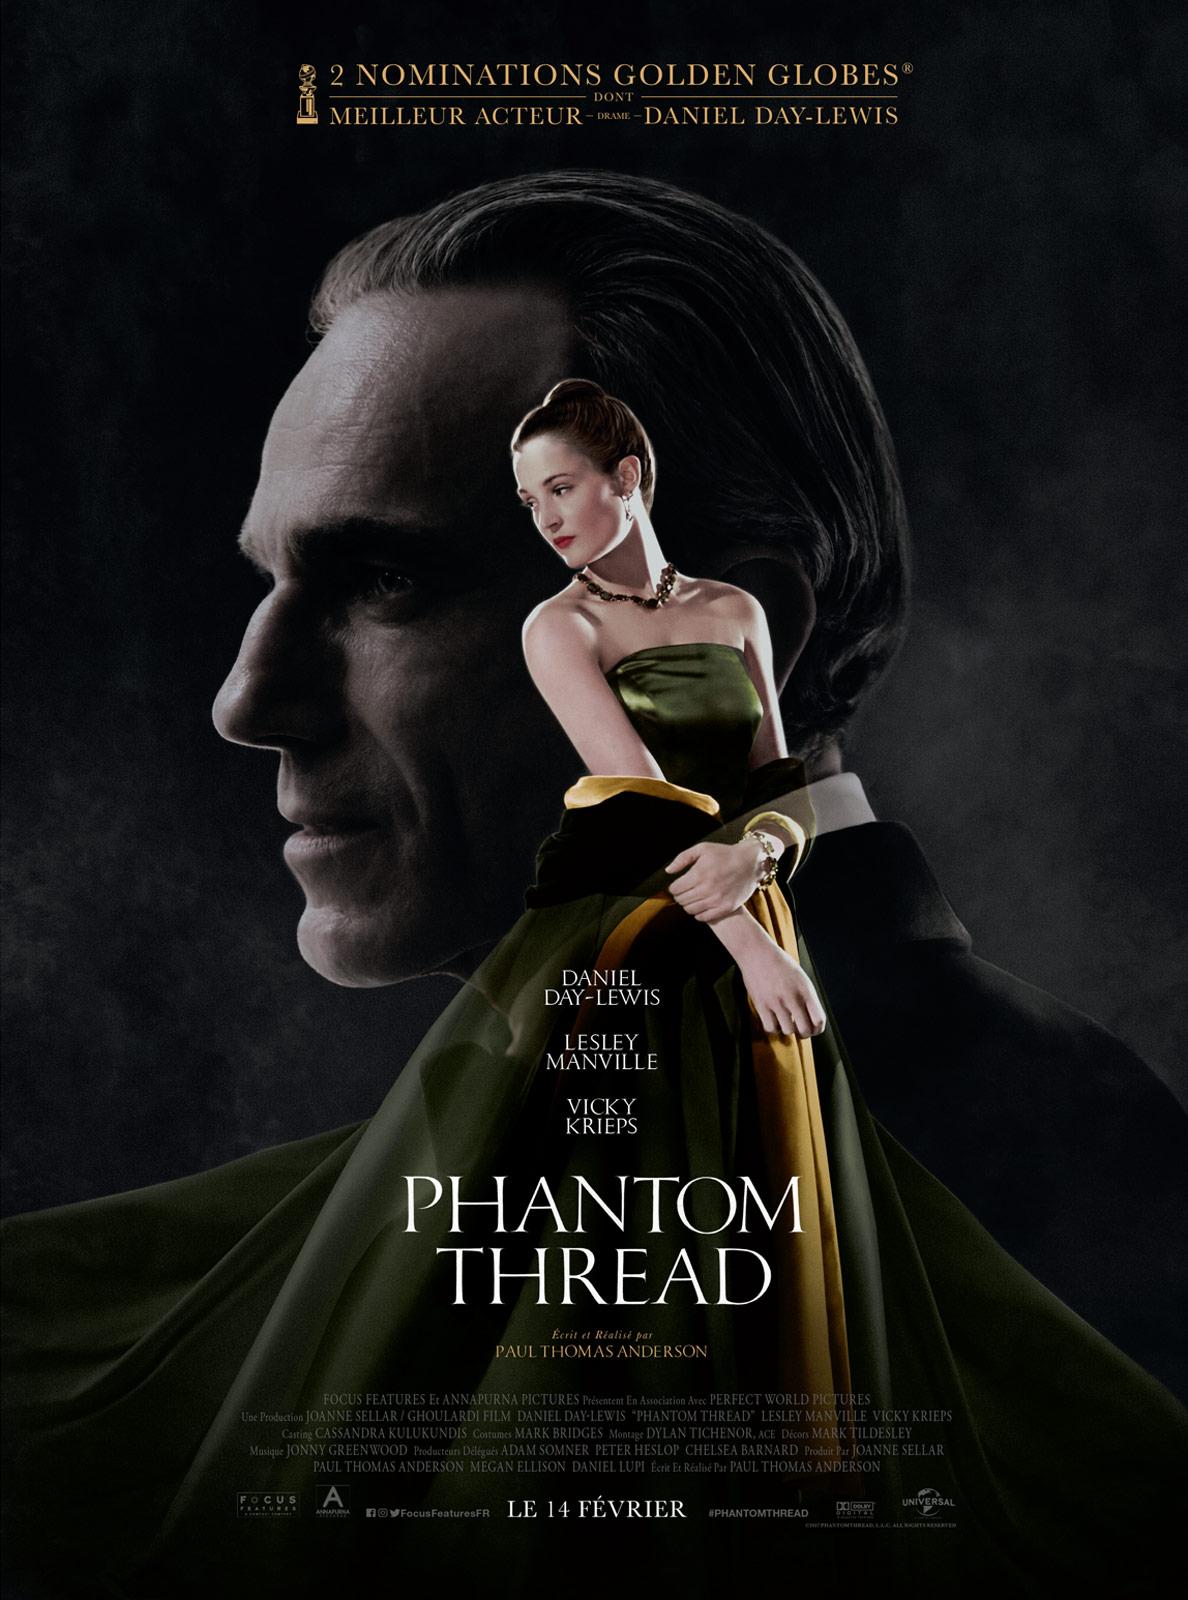 Phantom thread (2018) - de Paul Thomas Anderson